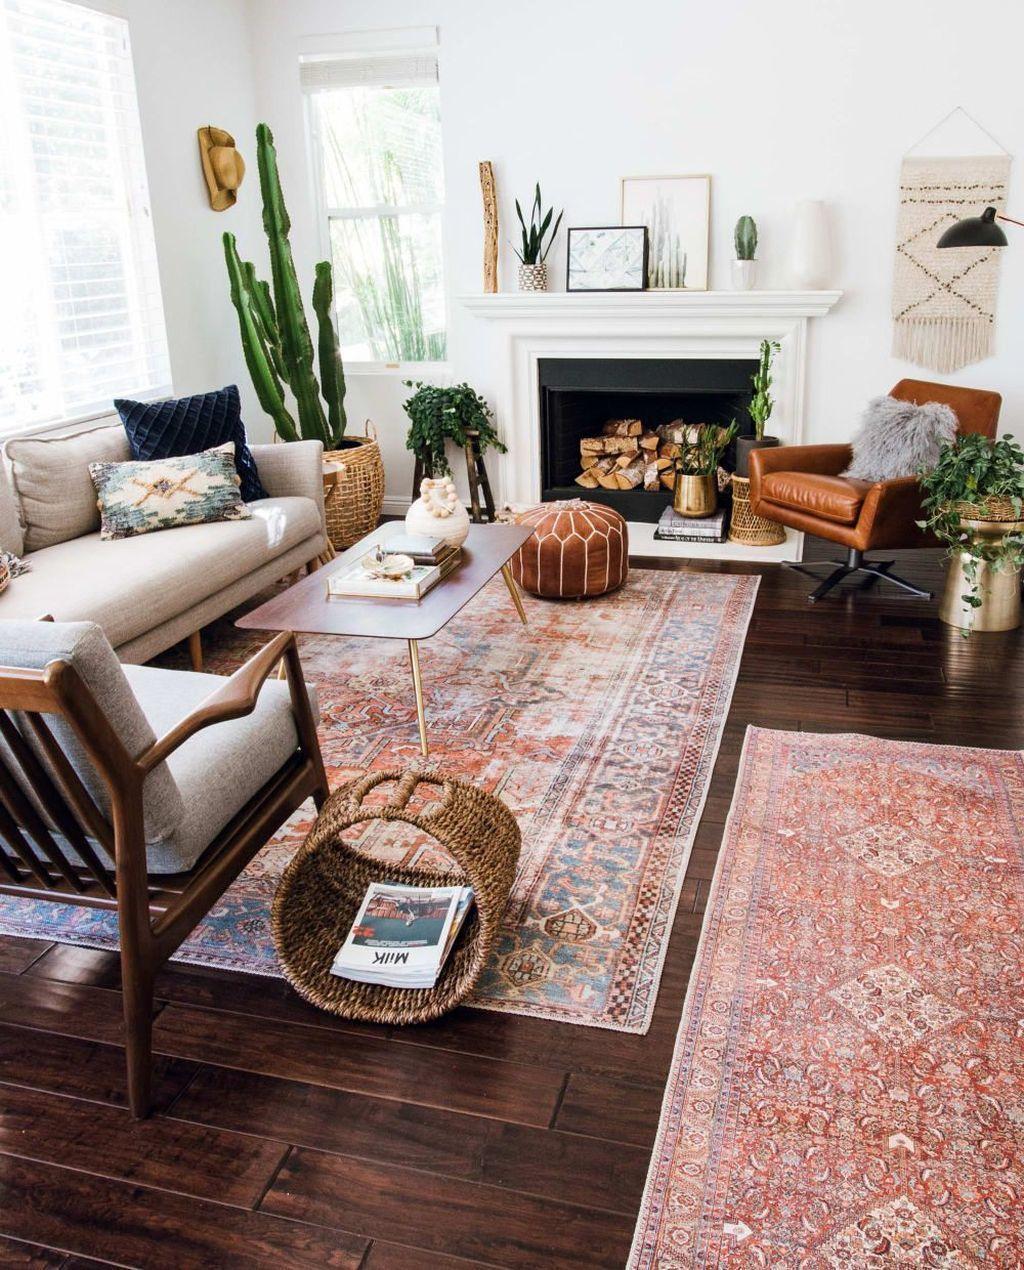 Unique Bohemian Decor Ideas For Living Room 19 in 2020 ...